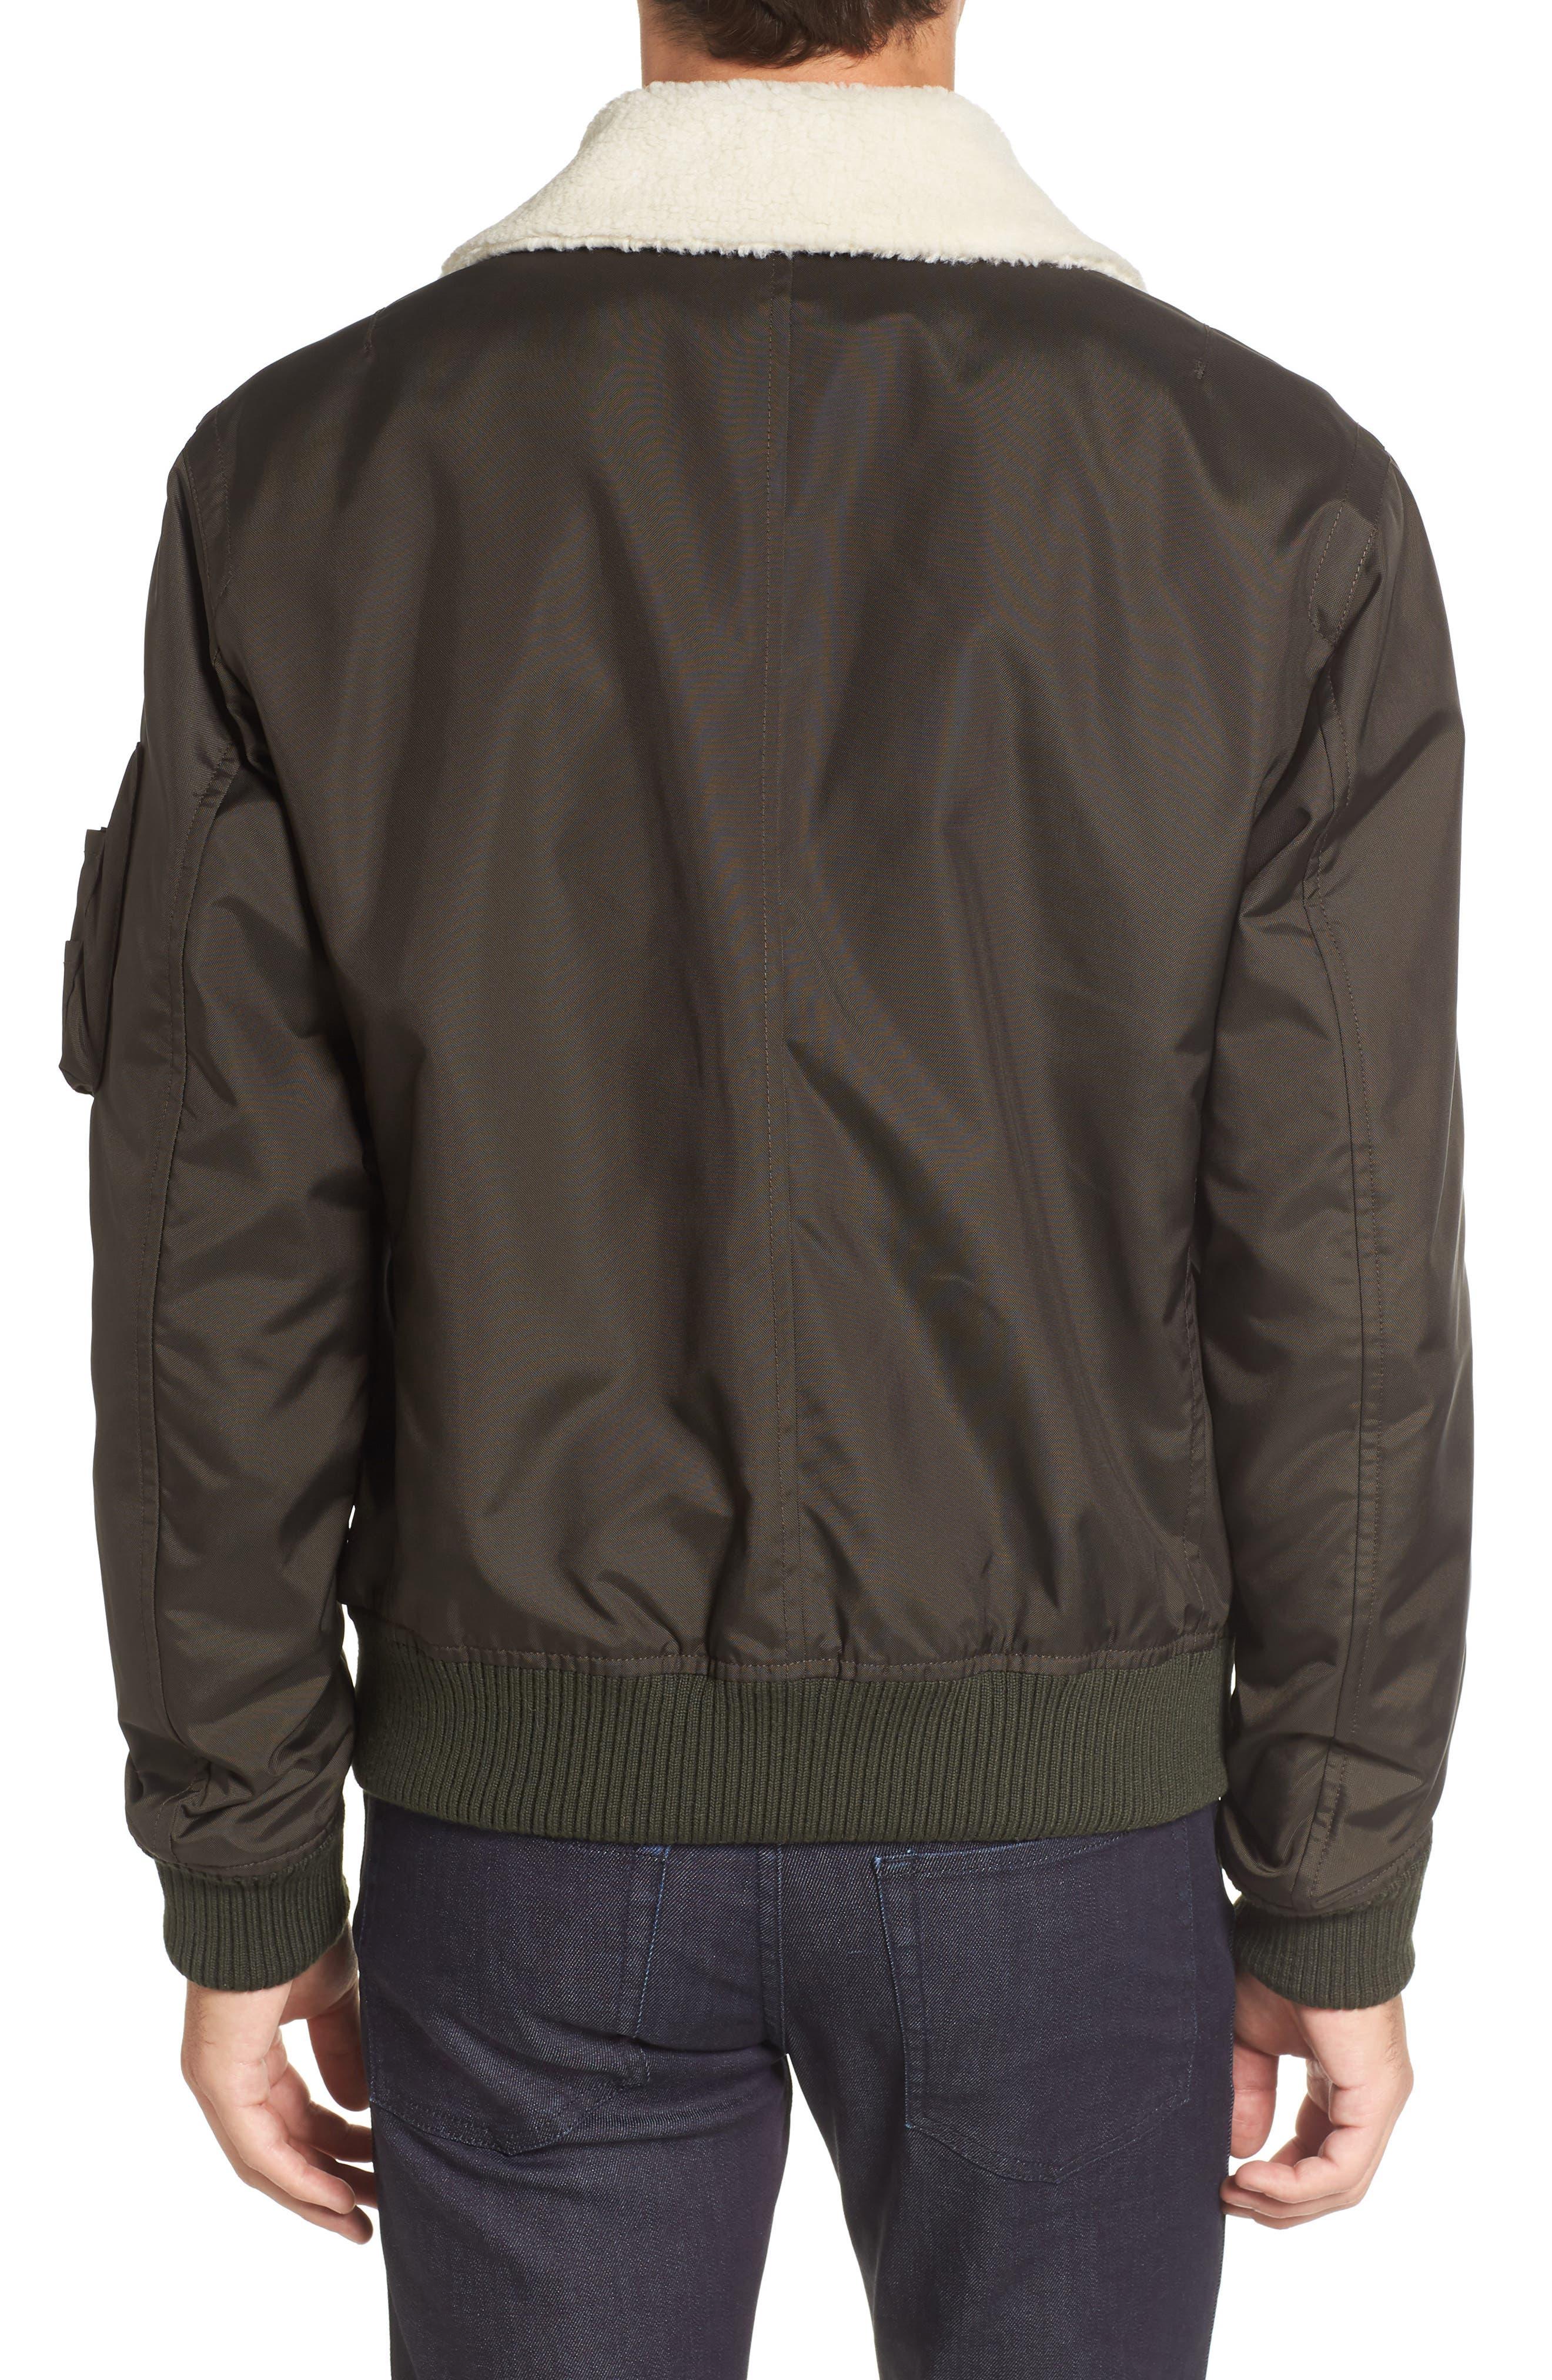 Cobra Aviator Jacket with Faux Fur Collar,                             Alternate thumbnail 2, color,                             342